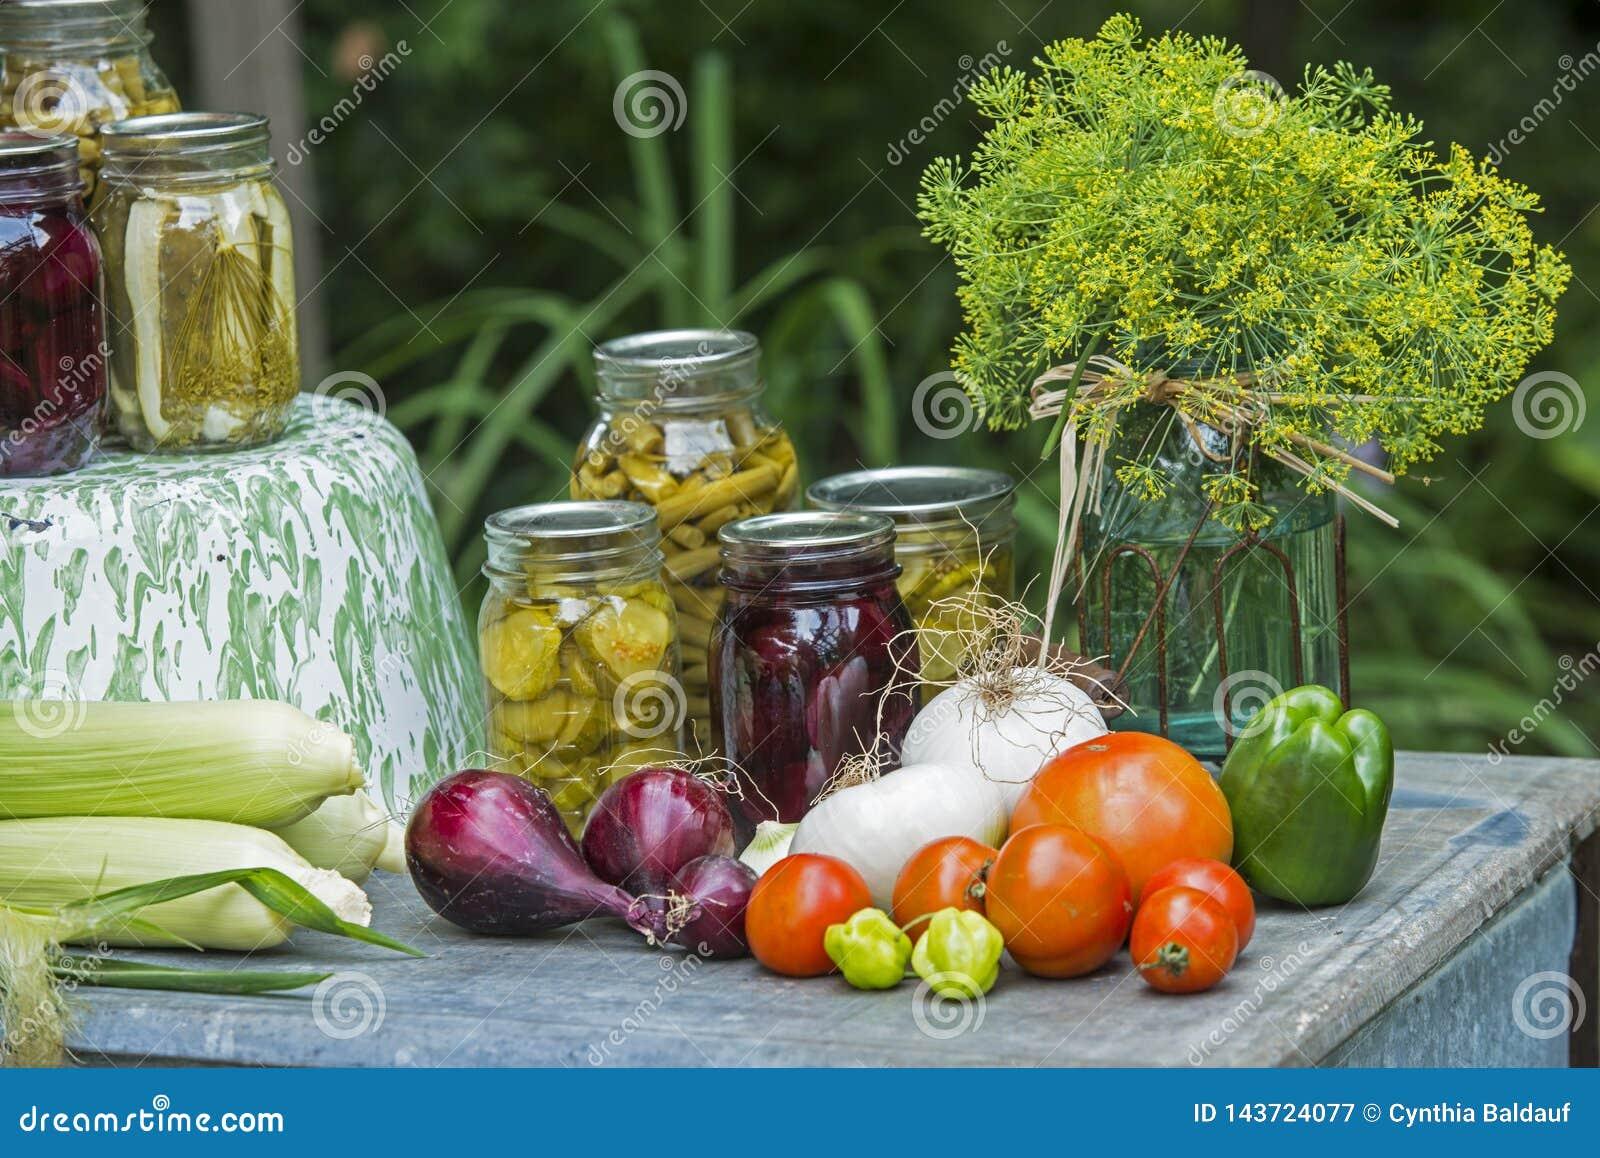 Bounty of Summer Vegetables from the Garden